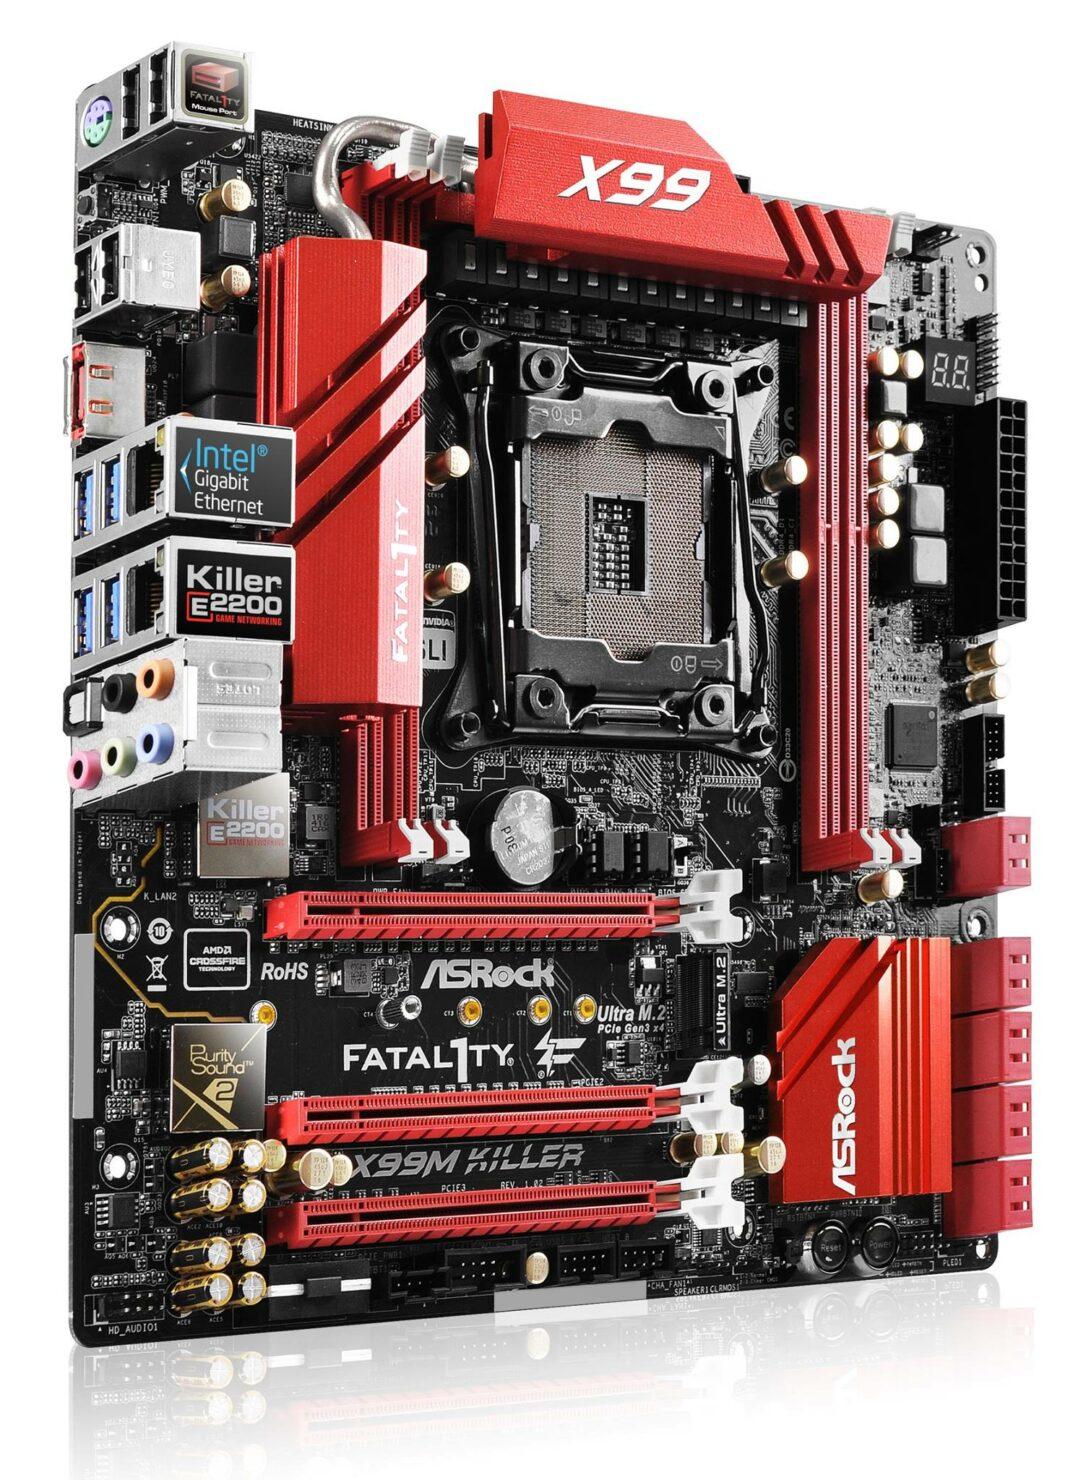 asrock-x99m-killer-fatal1ty-motherboard